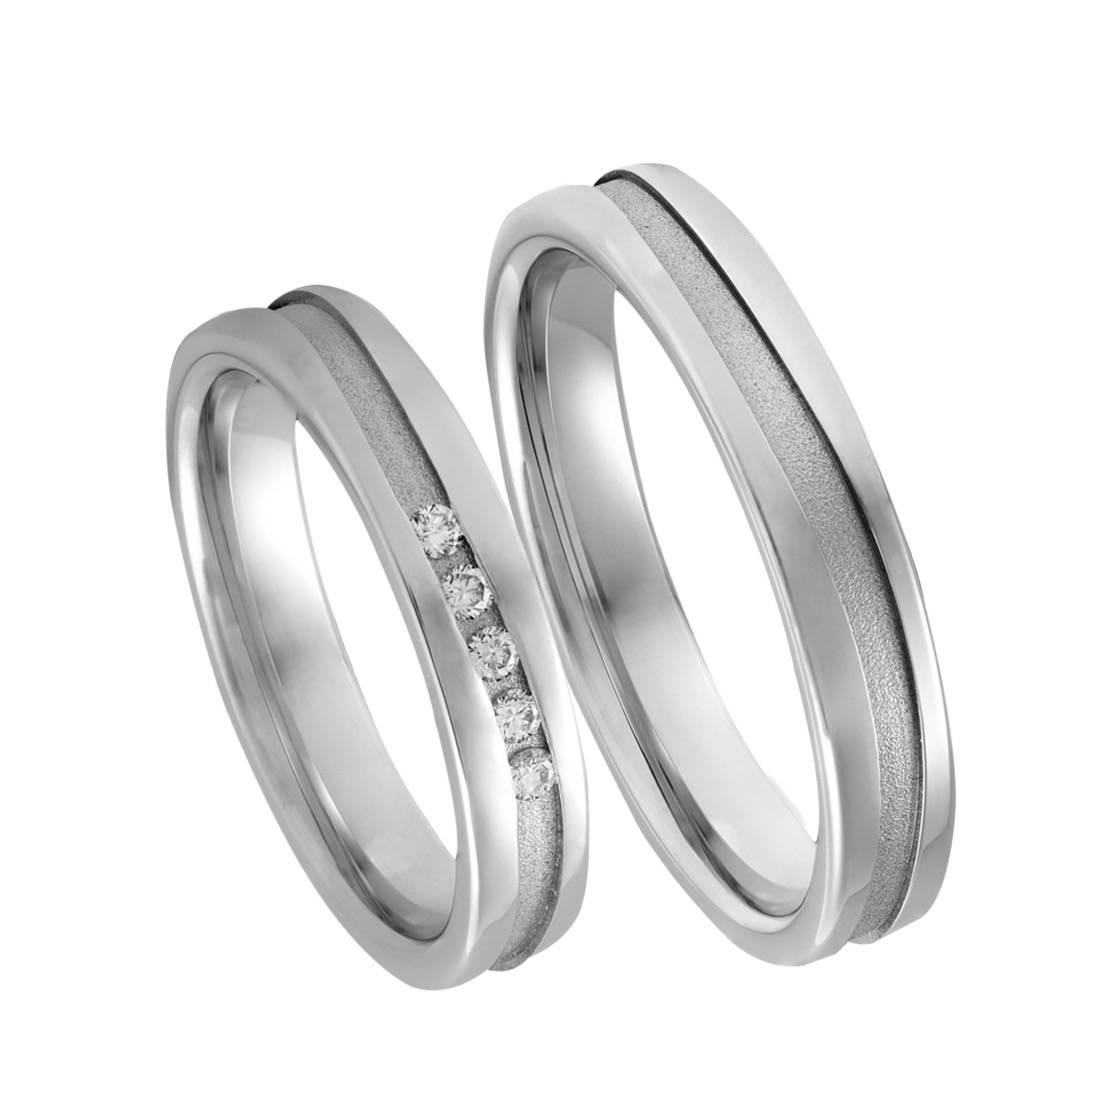 Juwelier Jan Maes - Trouwringen - Verlovingsringen - Juwelen - House of Weddings - 7